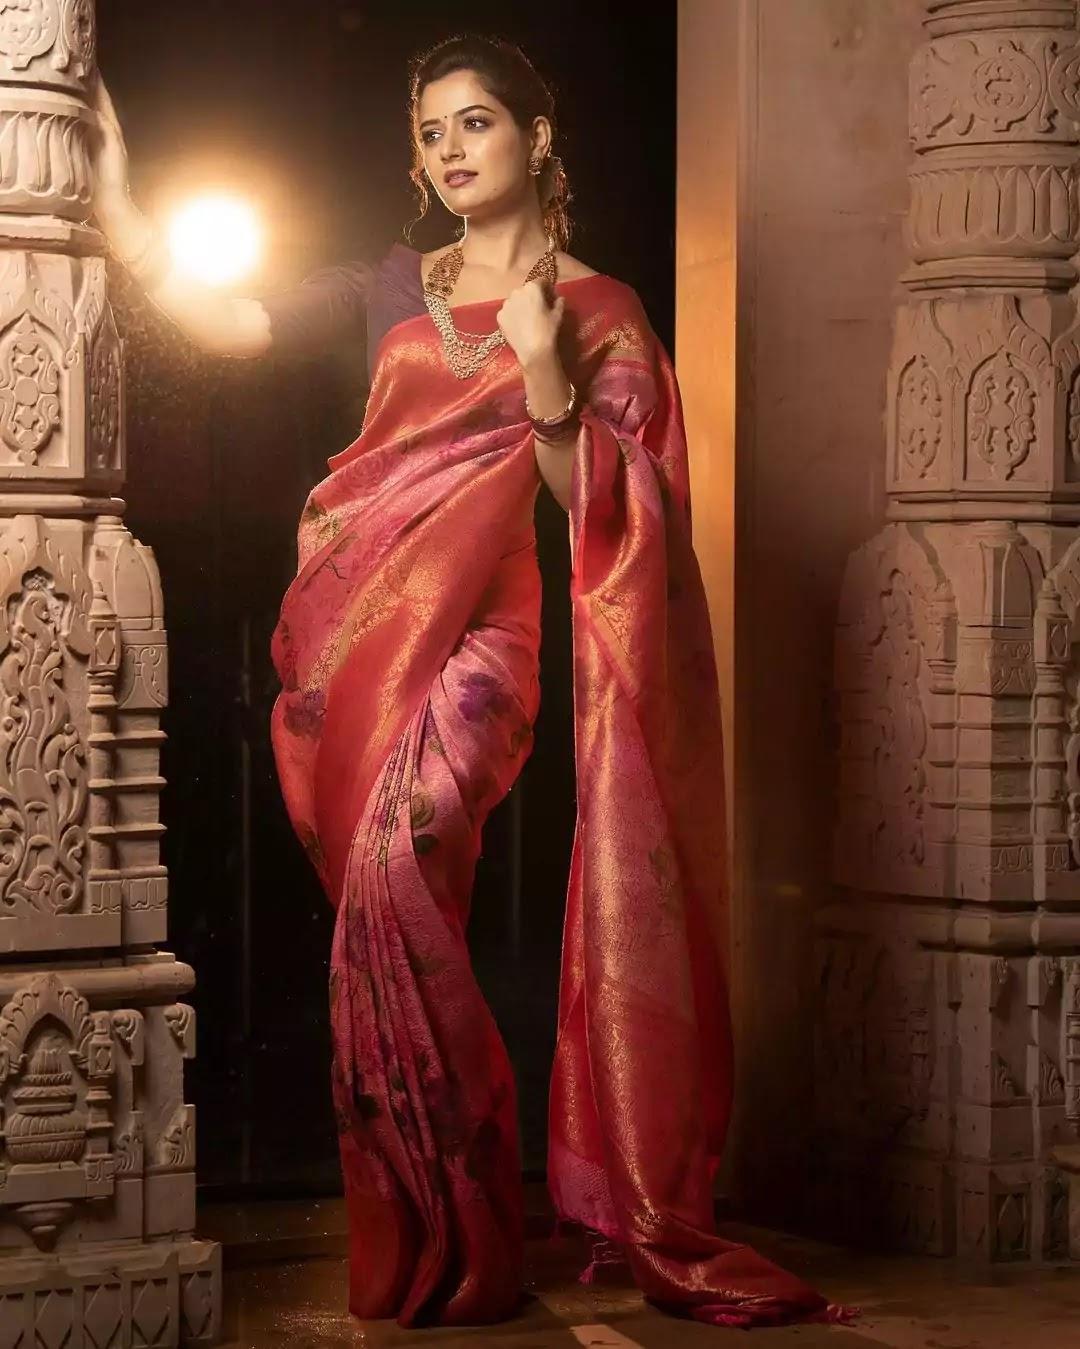 ashika-ranganath-in-floral-banarasi-saree